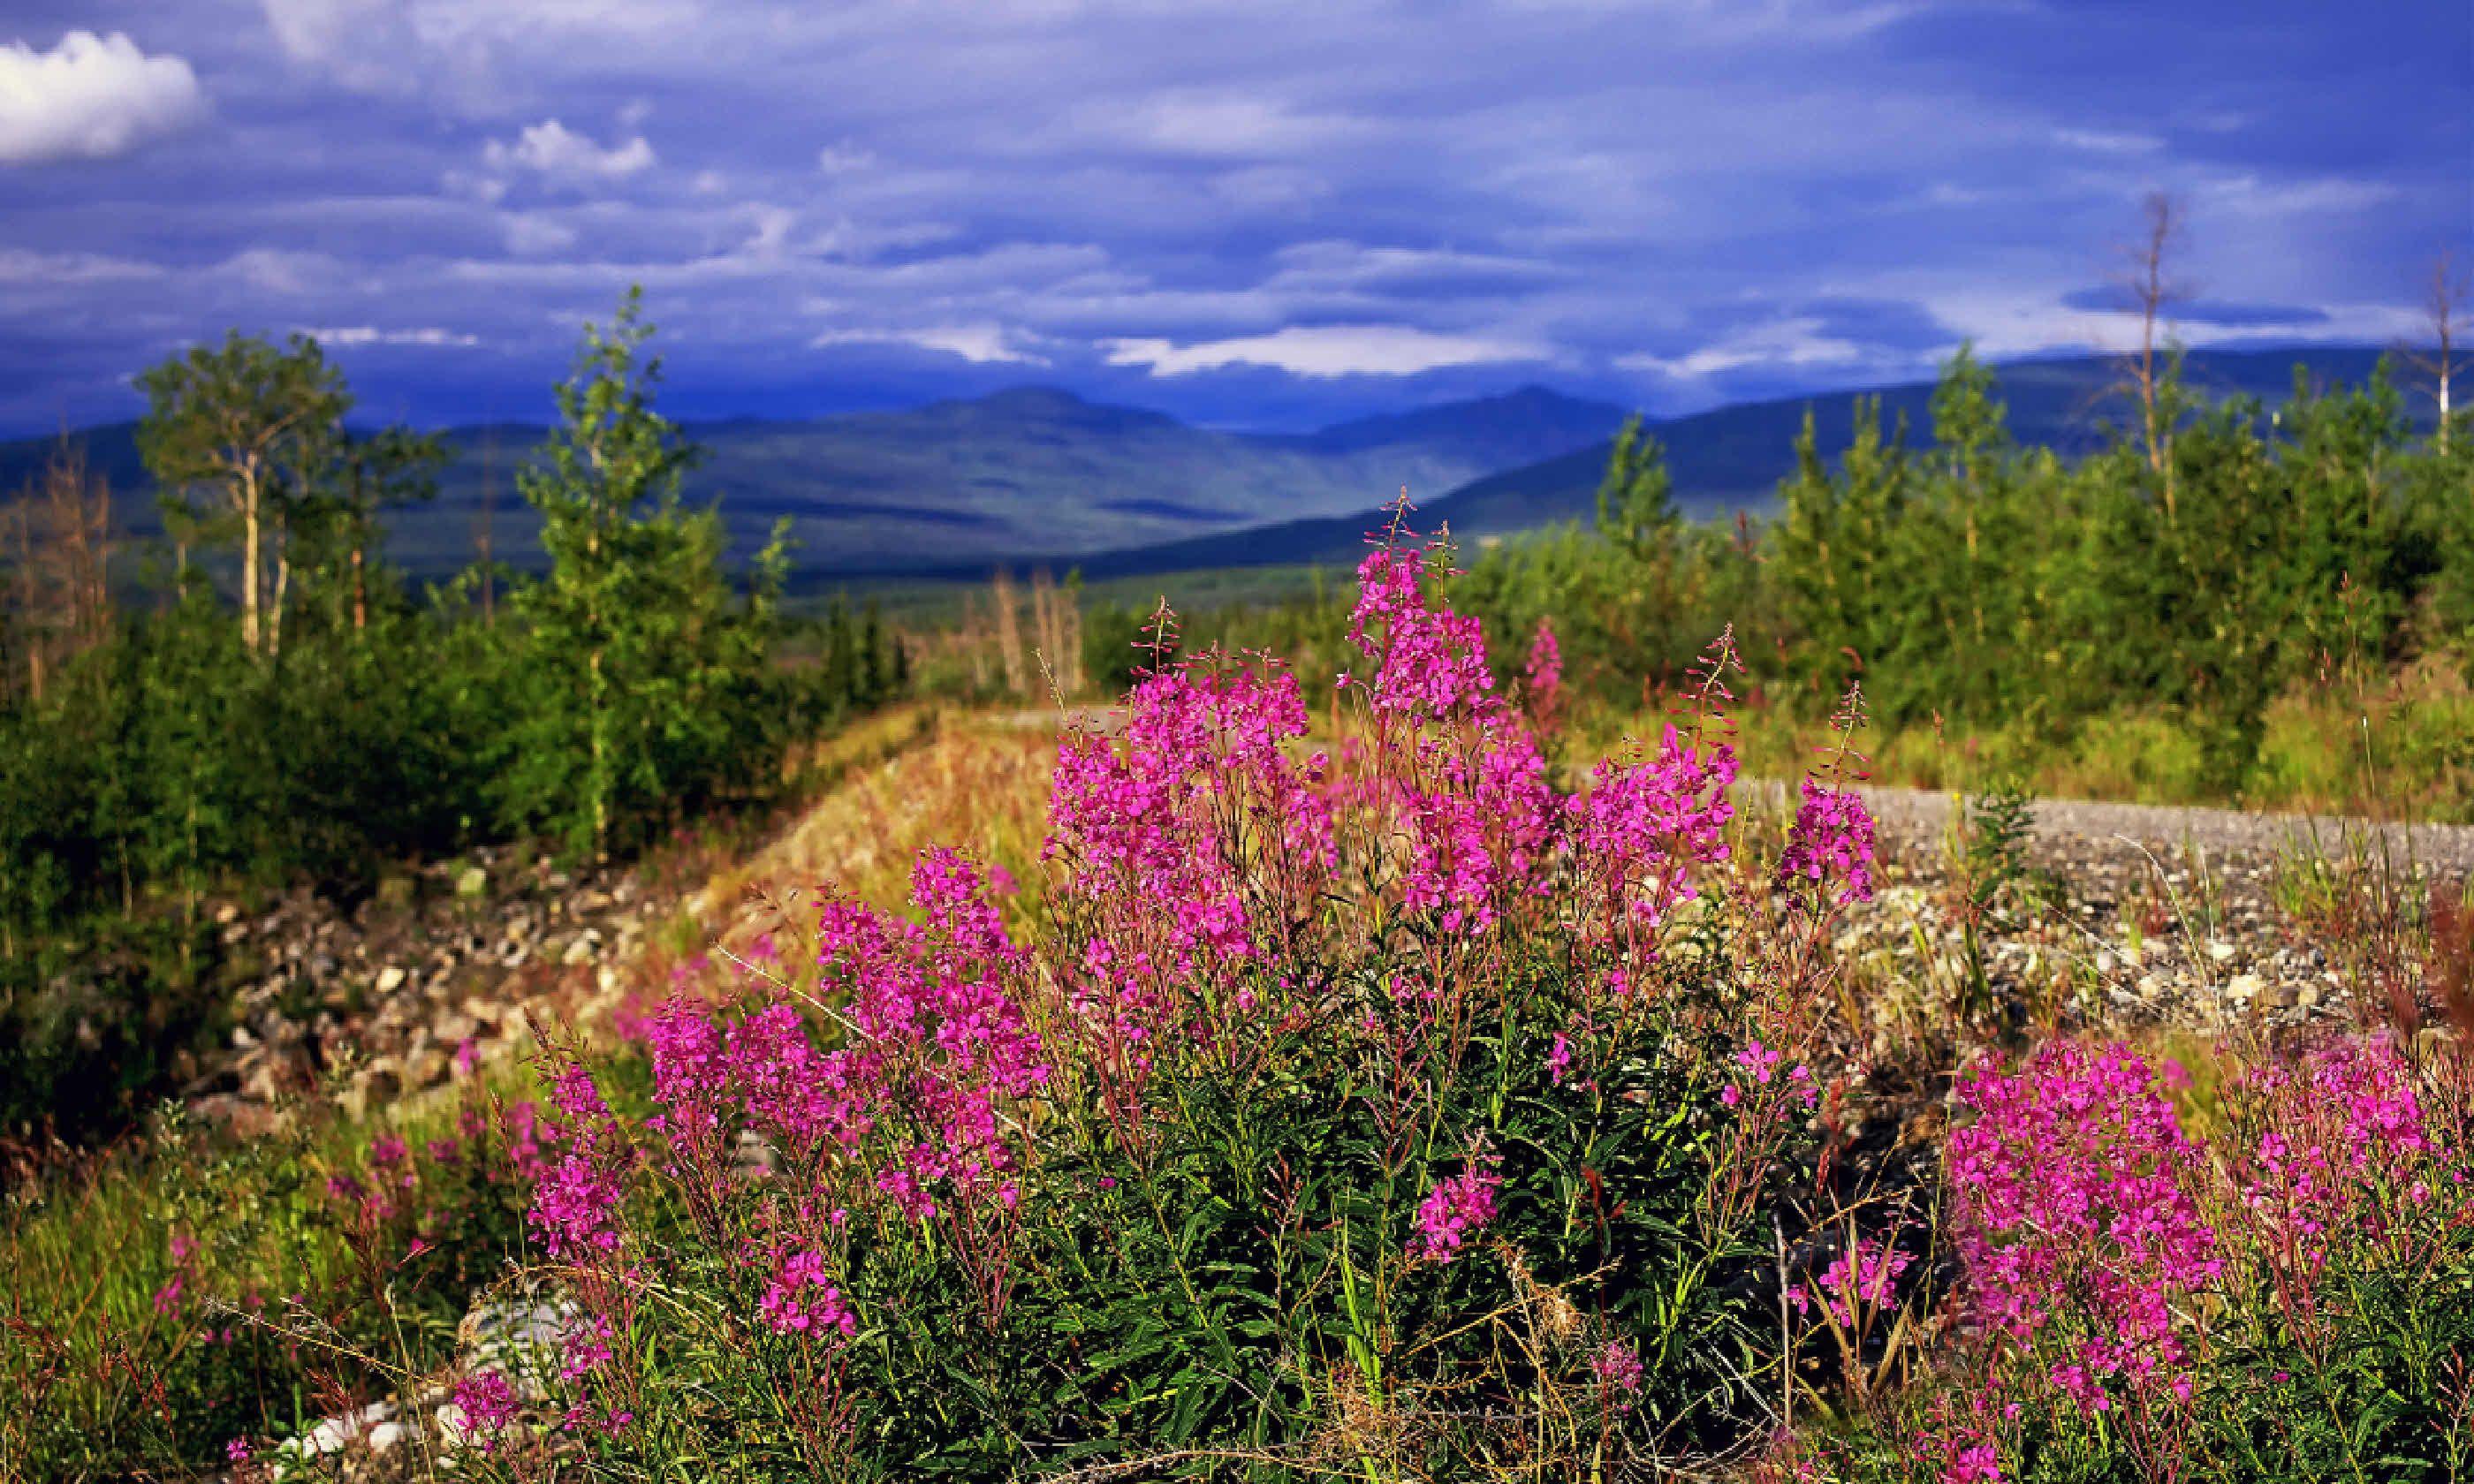 Northwest Territories, Canada (Shutterstock)